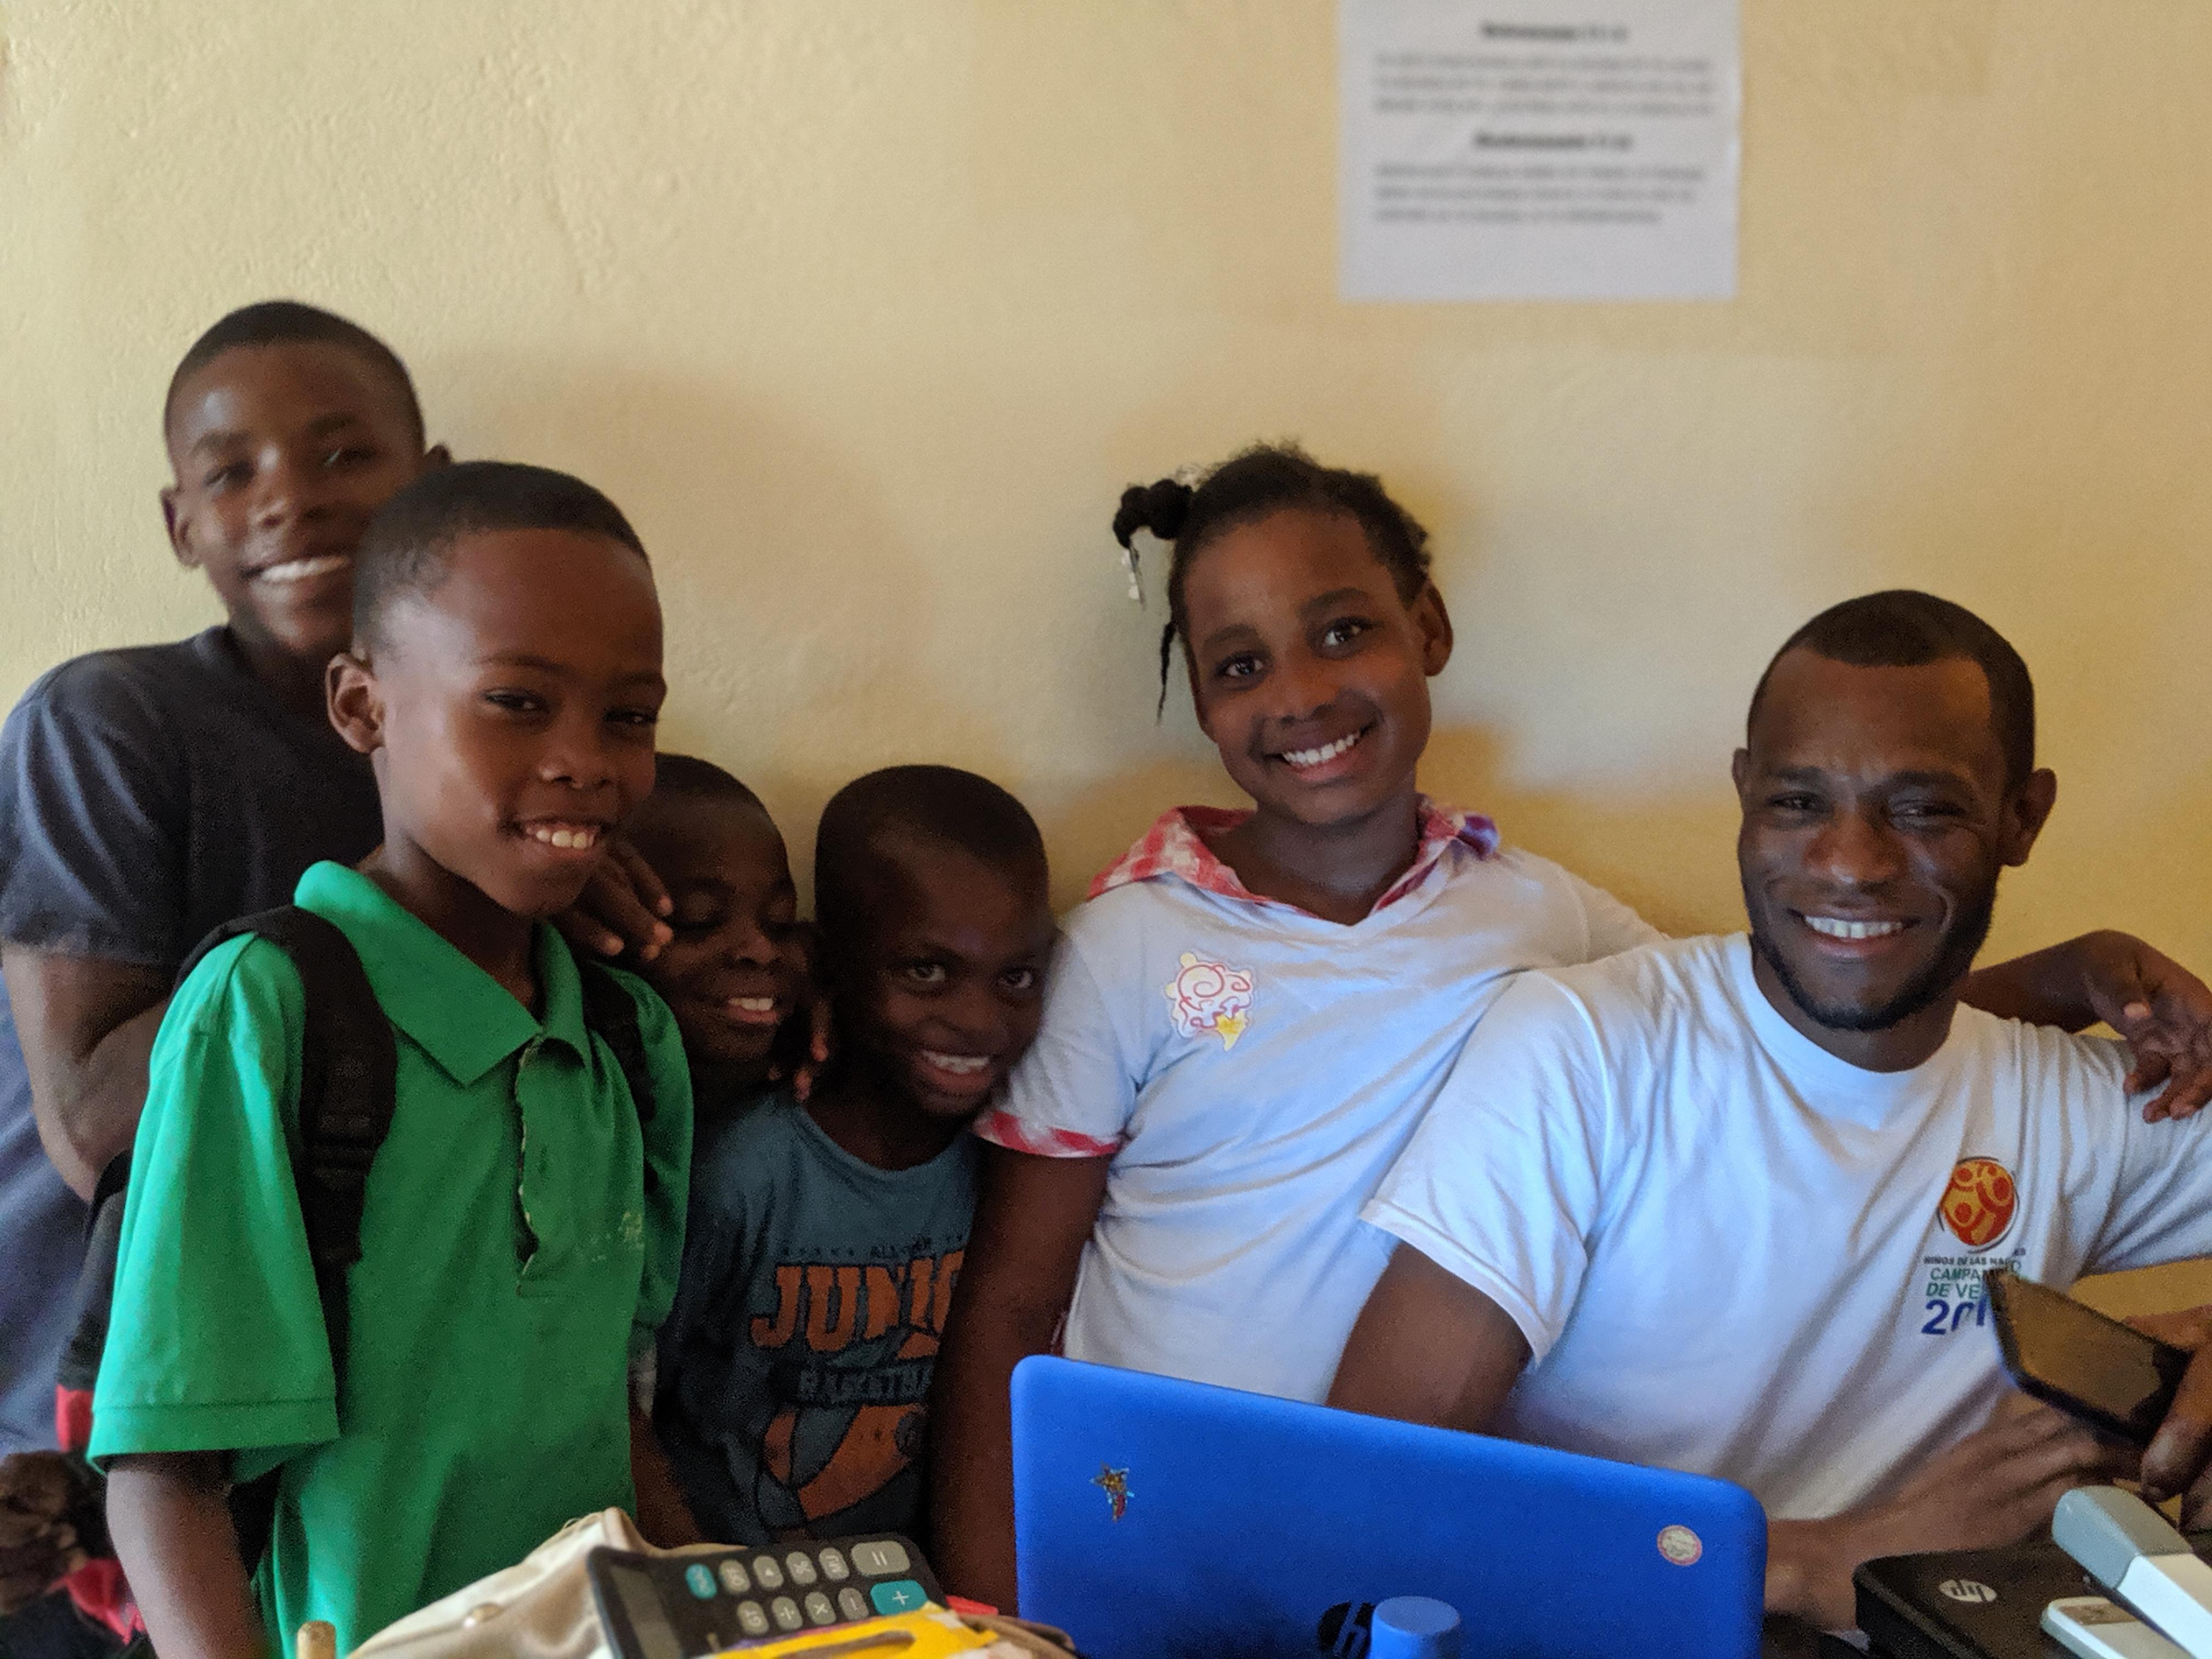 Ernesto with children in the afterschool program.